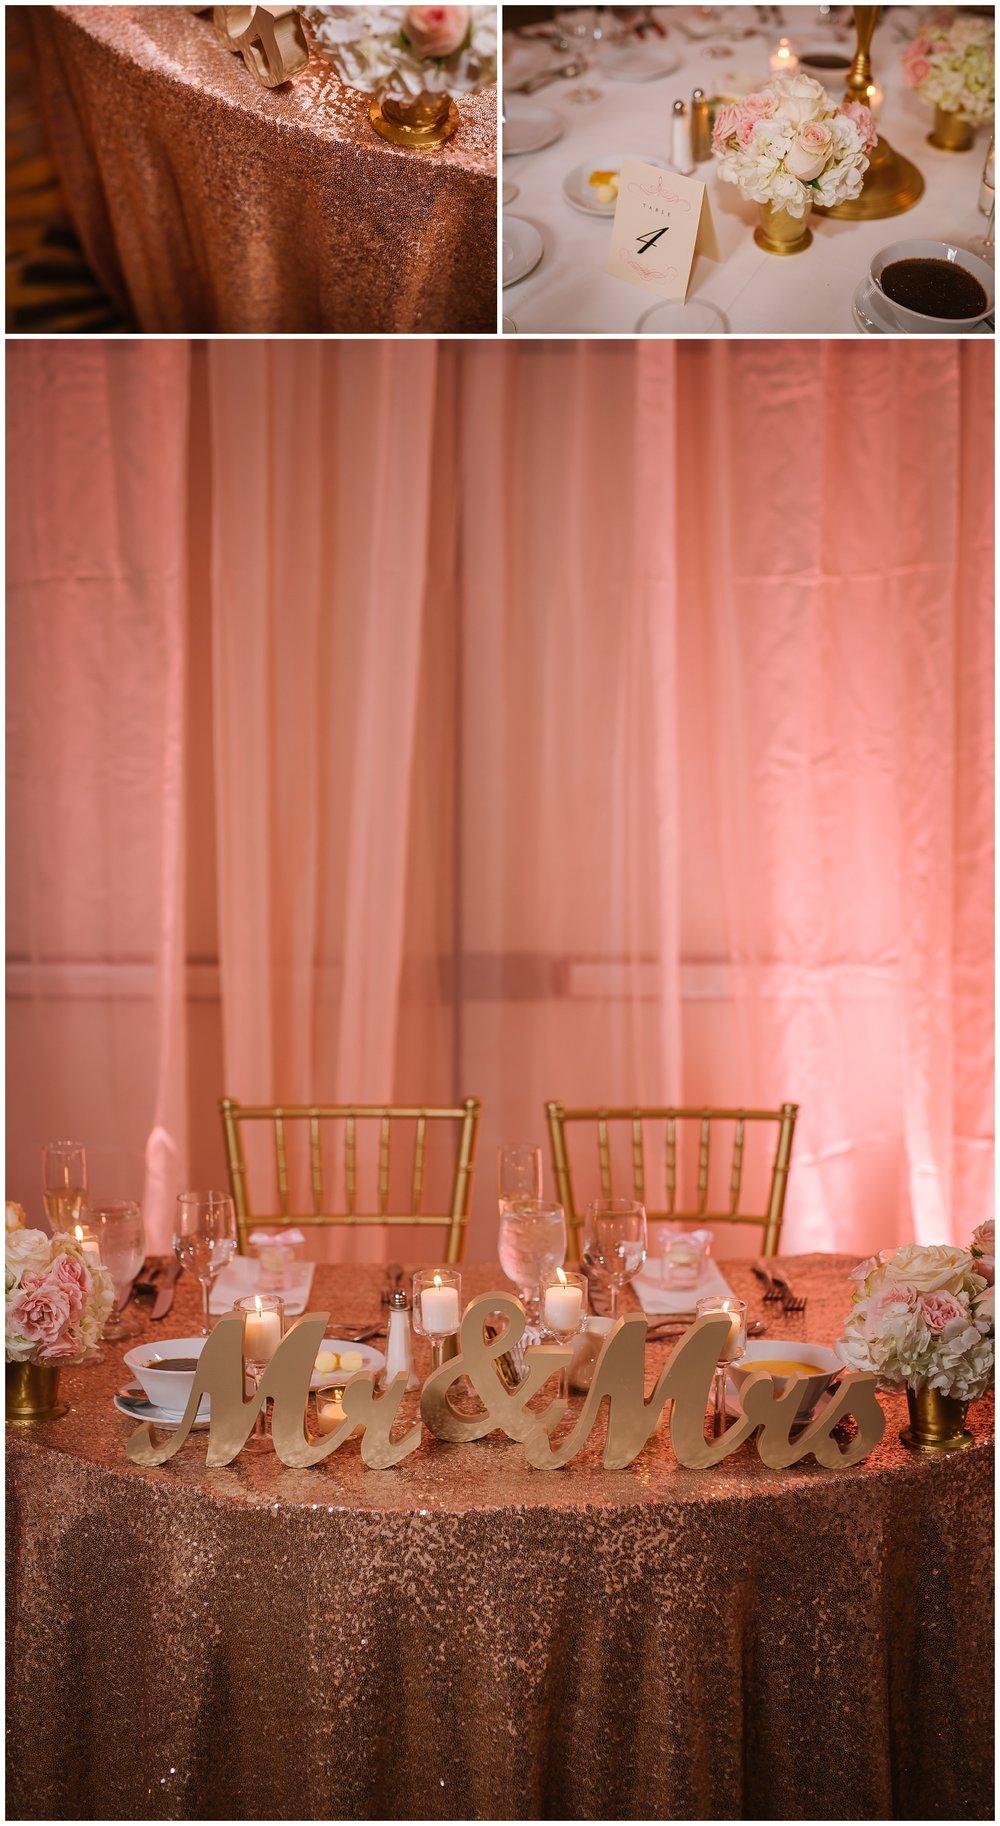 Sarasota-wedding-photographer-hyatt-regency-blush_0057.jpg